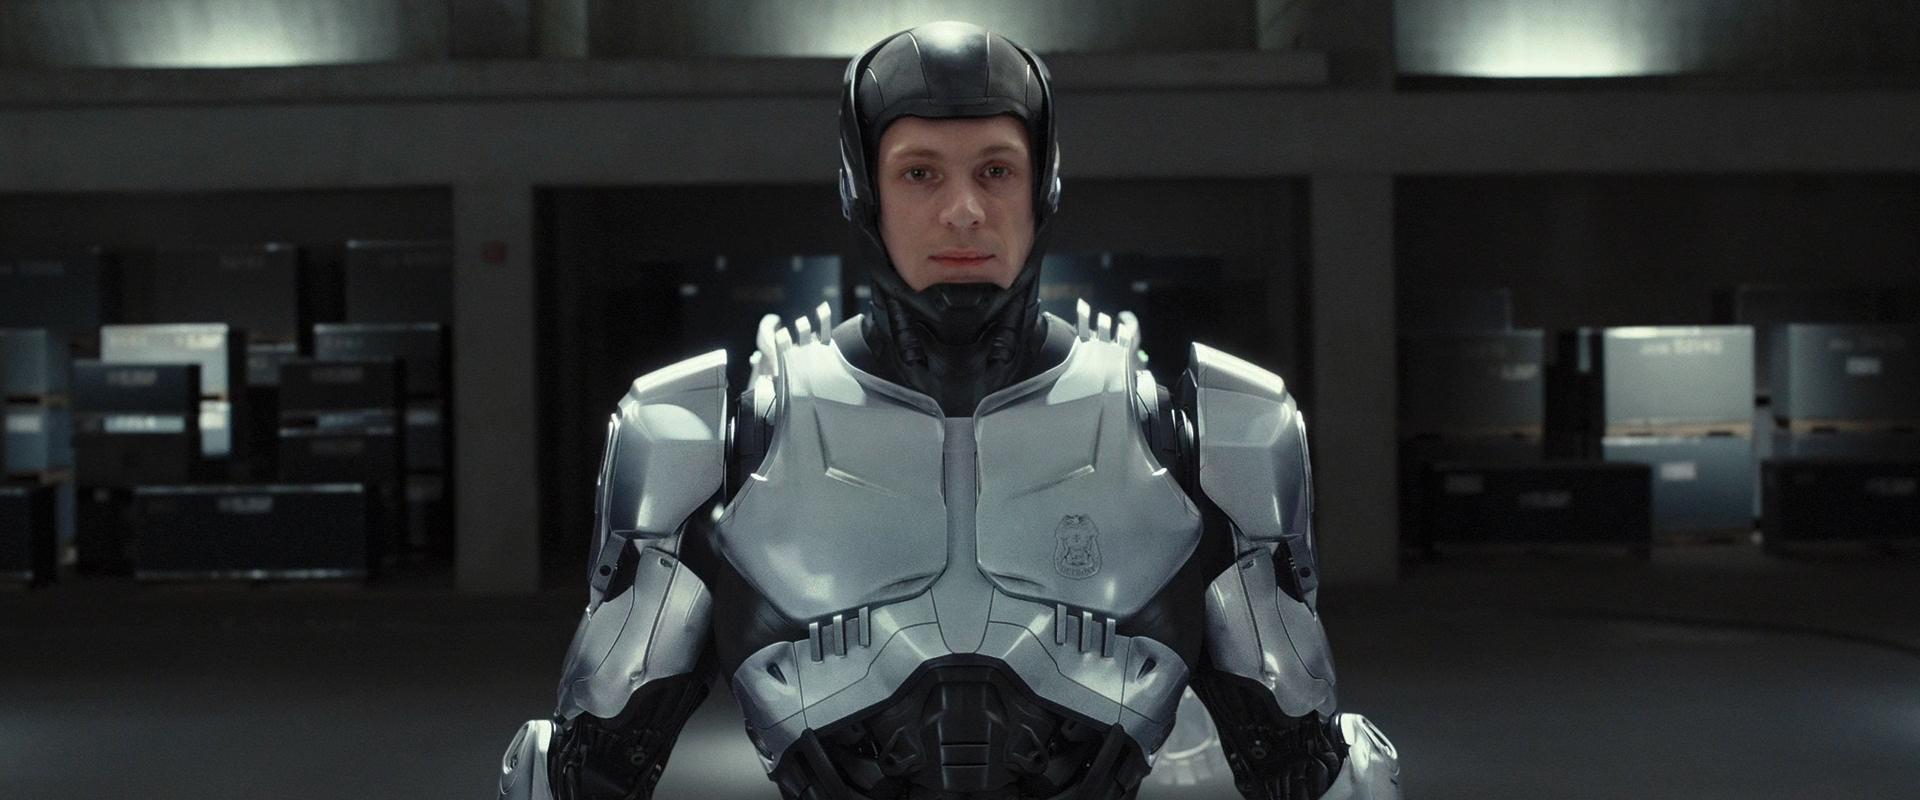 RoboCop (2014) 1080p BRRip Latino - Ingles